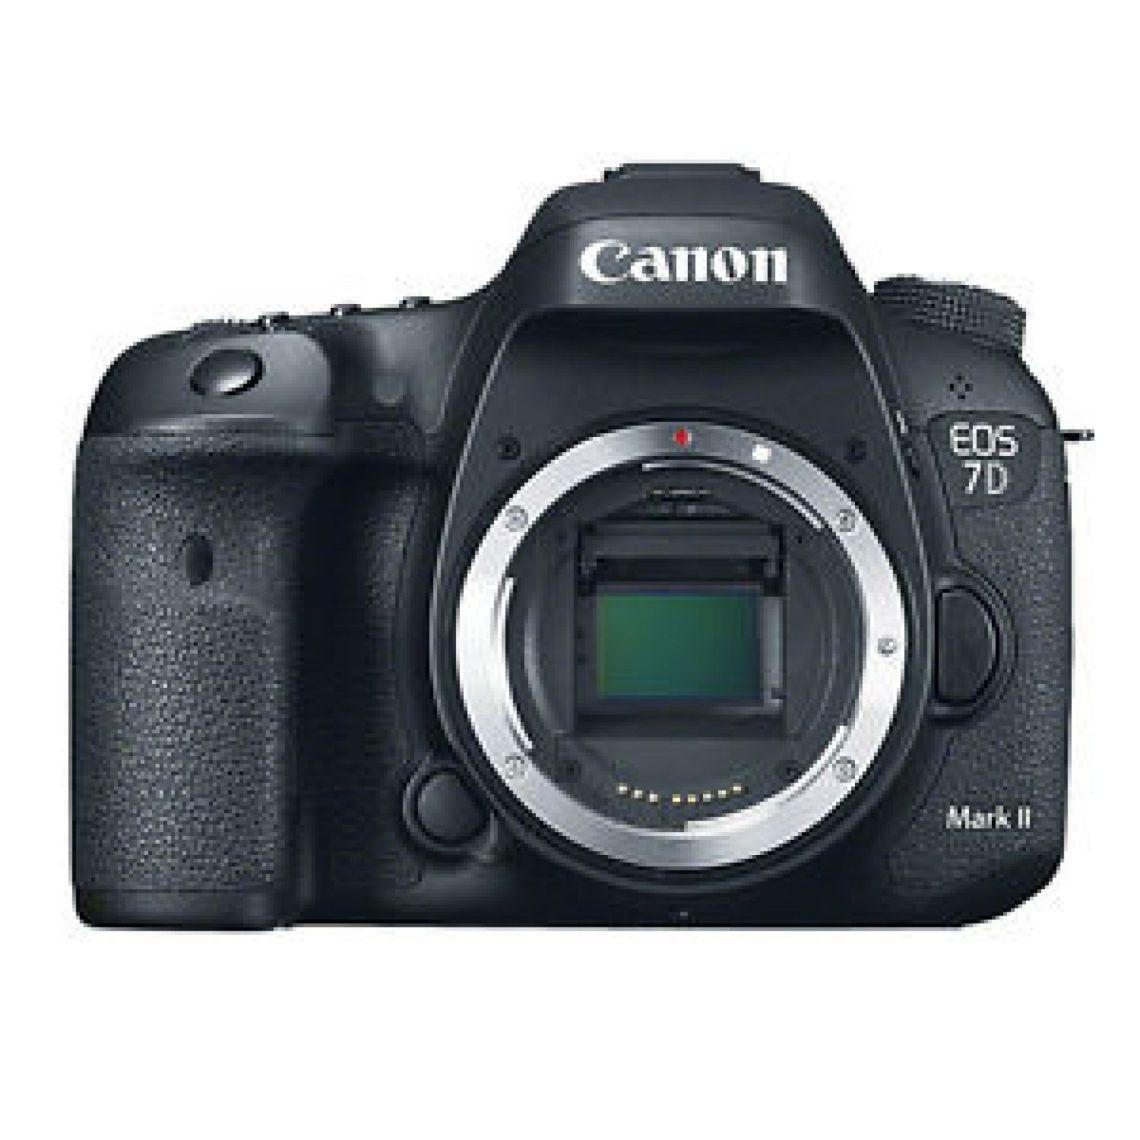 Canon EOS 7D Mark II 20.2MP Digital SLR Camera Body 13803236989 | eBay